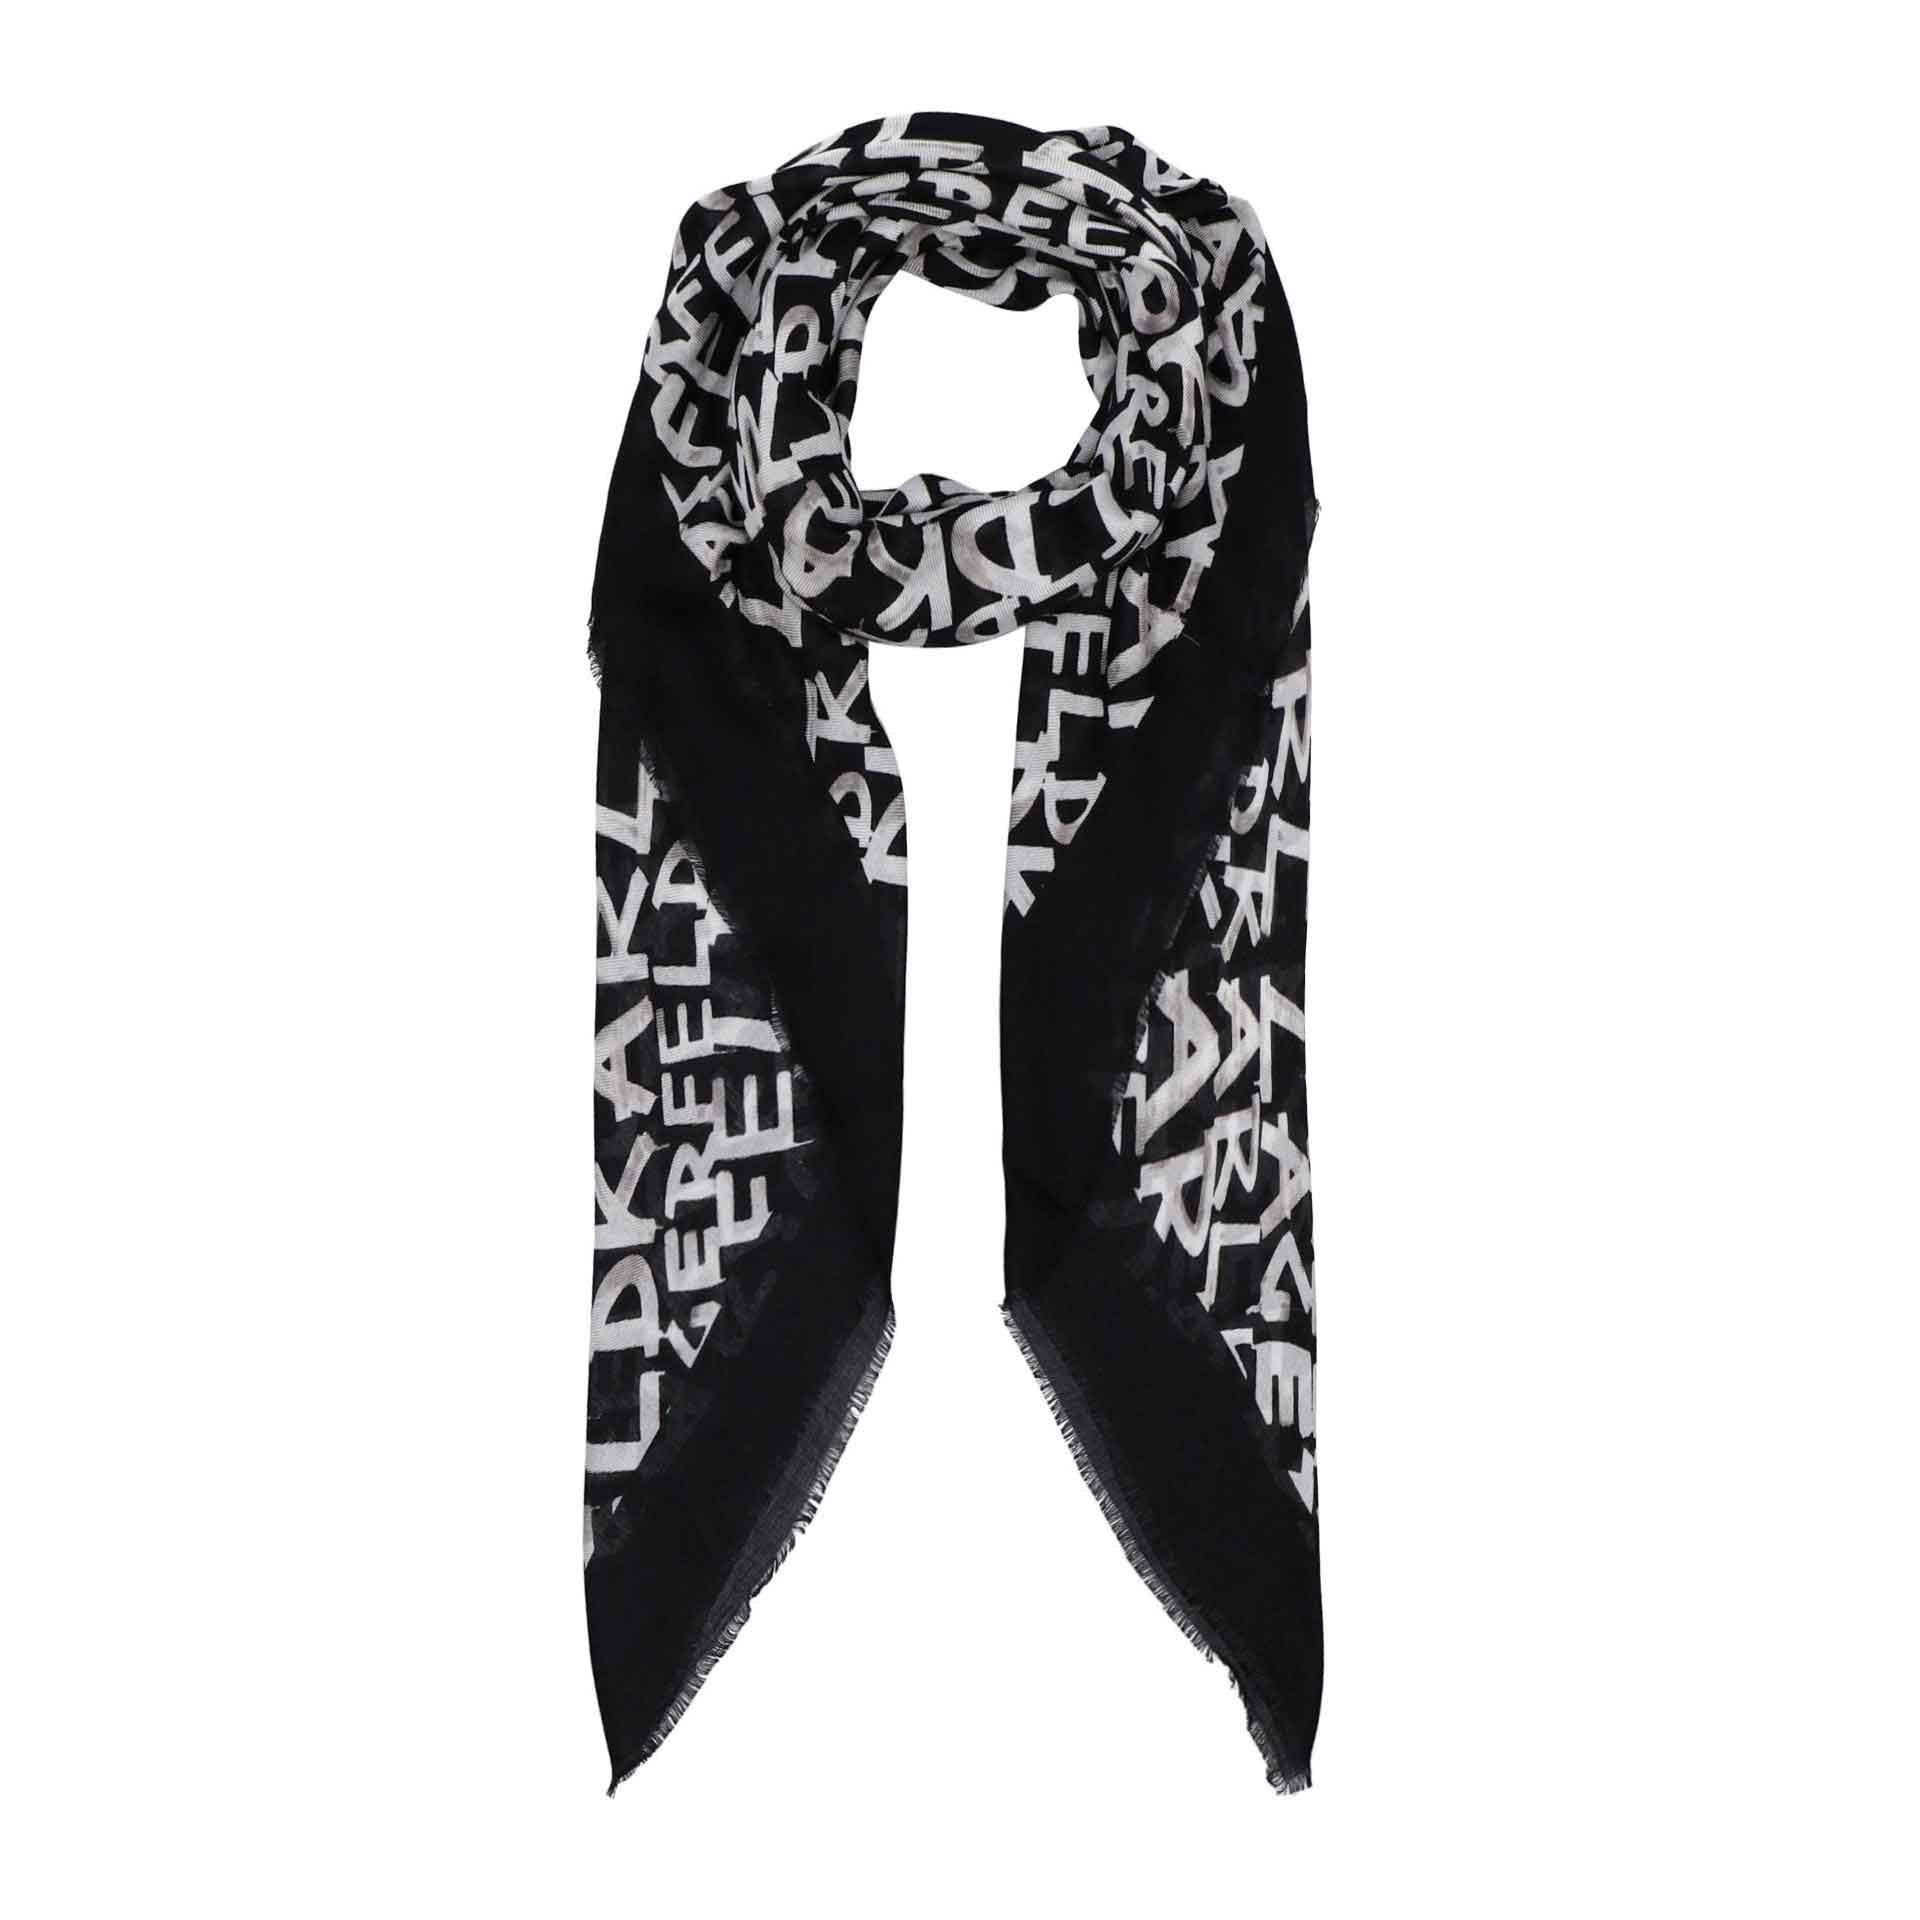 Karl Lagerfeld Grafiti Aop Square Scarf black white